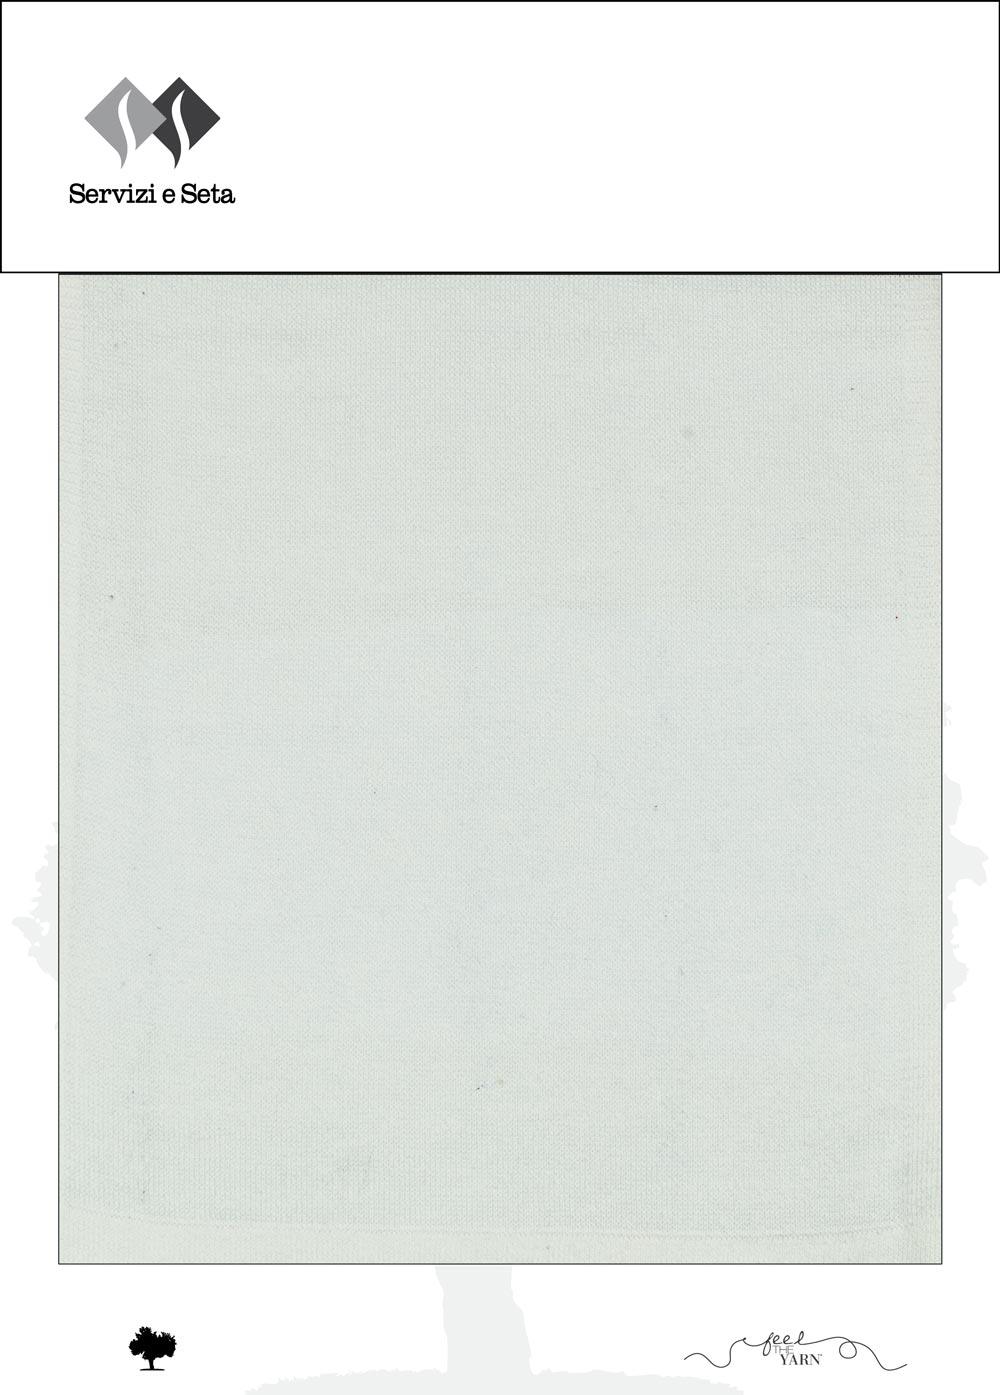 SeS_PE-22_Cottonsilk-Shandong-Viscosette-Viselle2